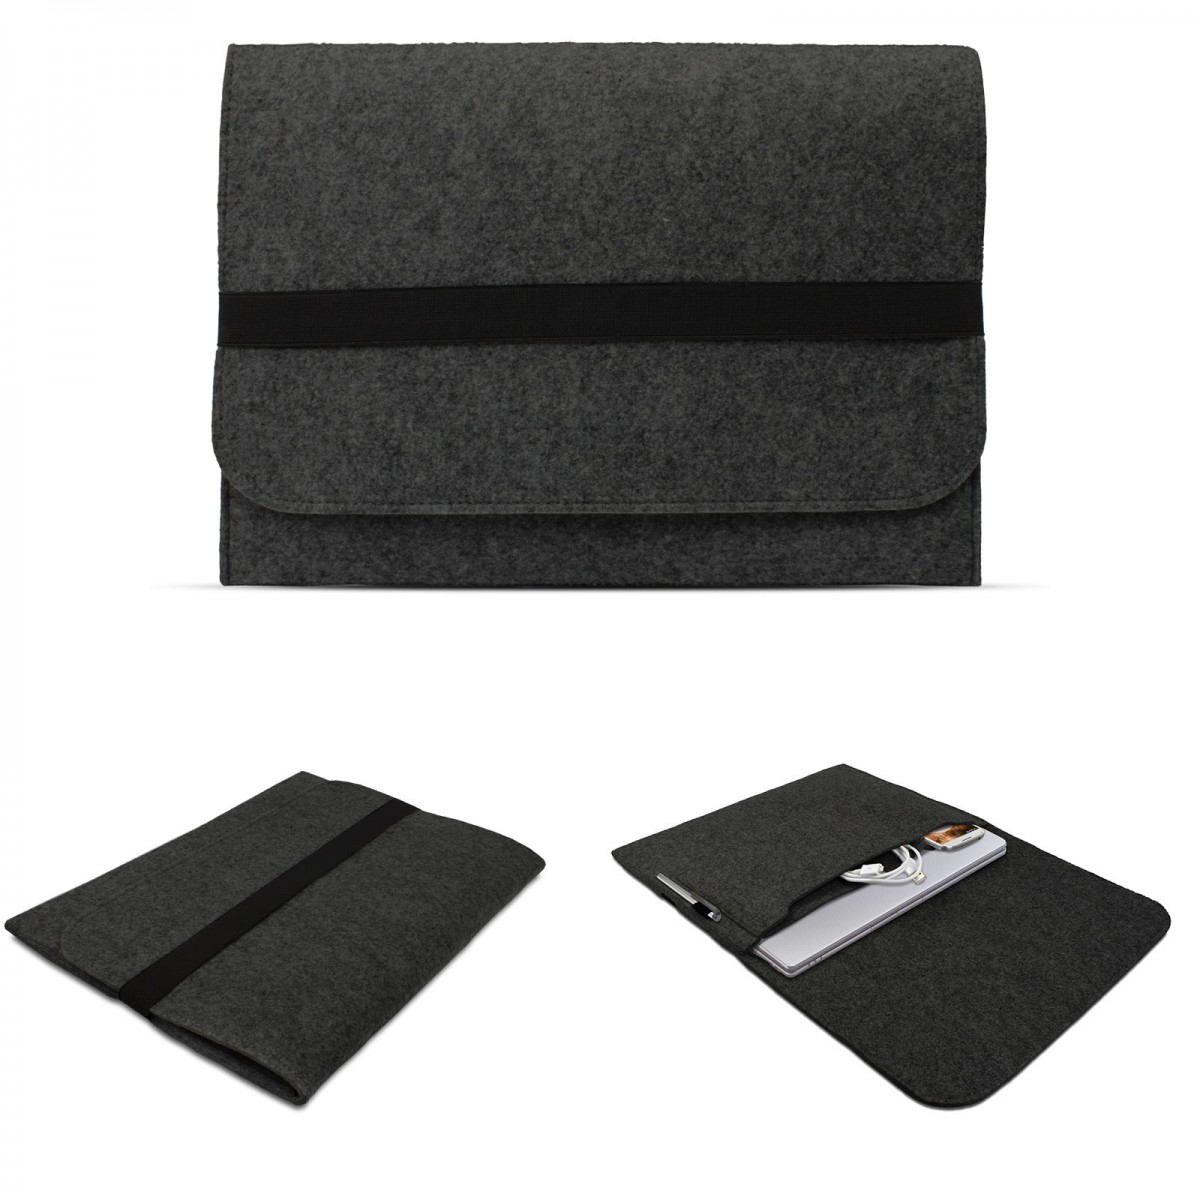 efabrik filz schutzh lle f r lenovo thinkpad yoga 12 5. Black Bedroom Furniture Sets. Home Design Ideas